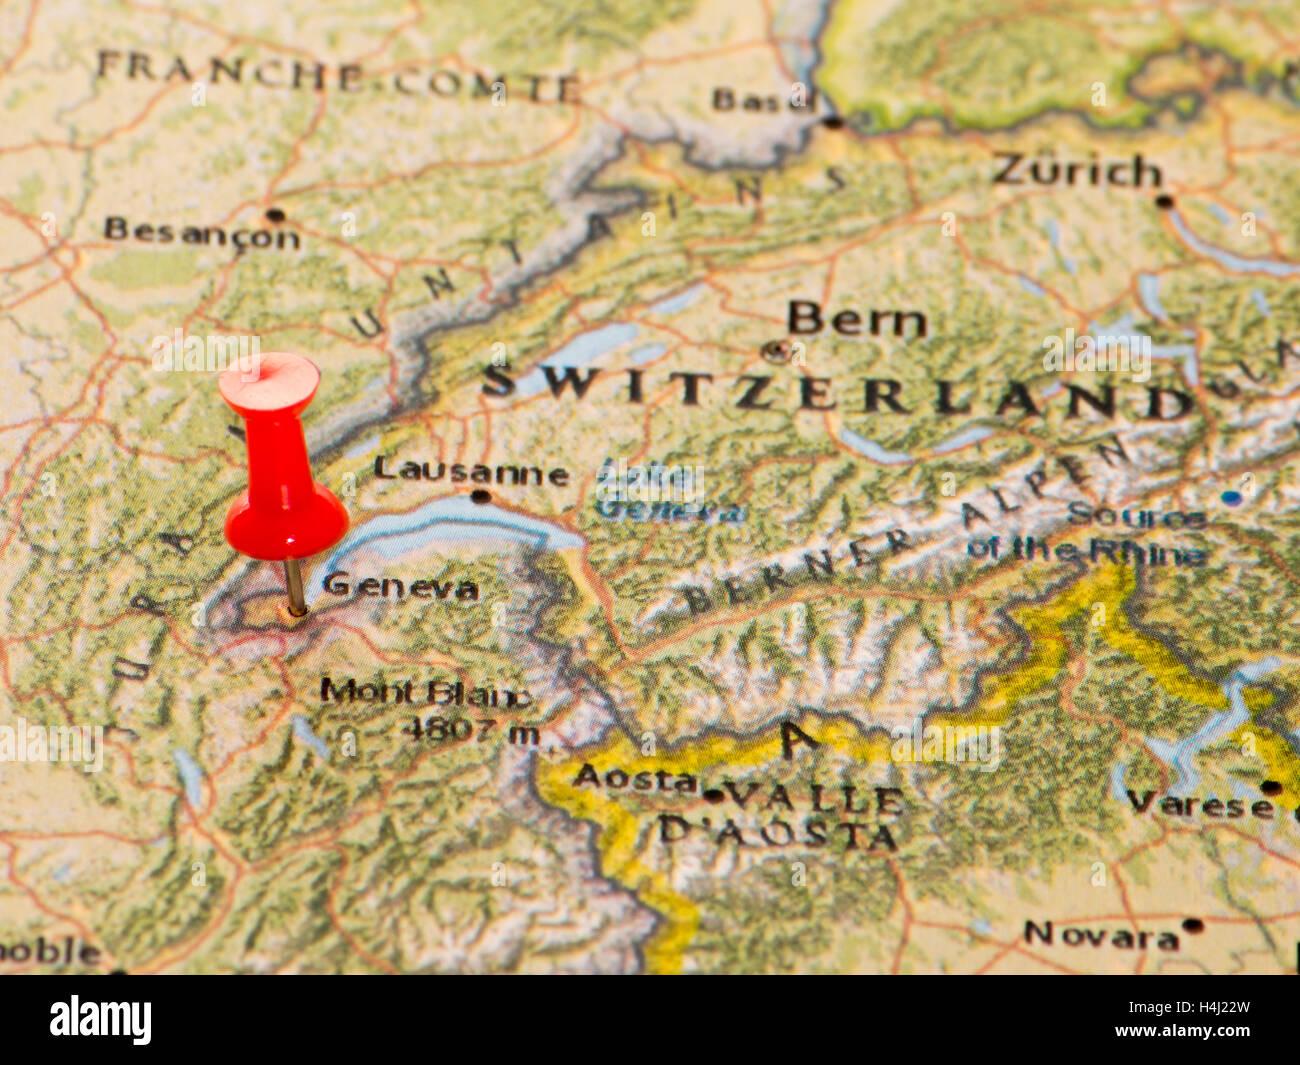 Geneva Switzerland Pinned On A Map Of Europe Stock Photo 123327985